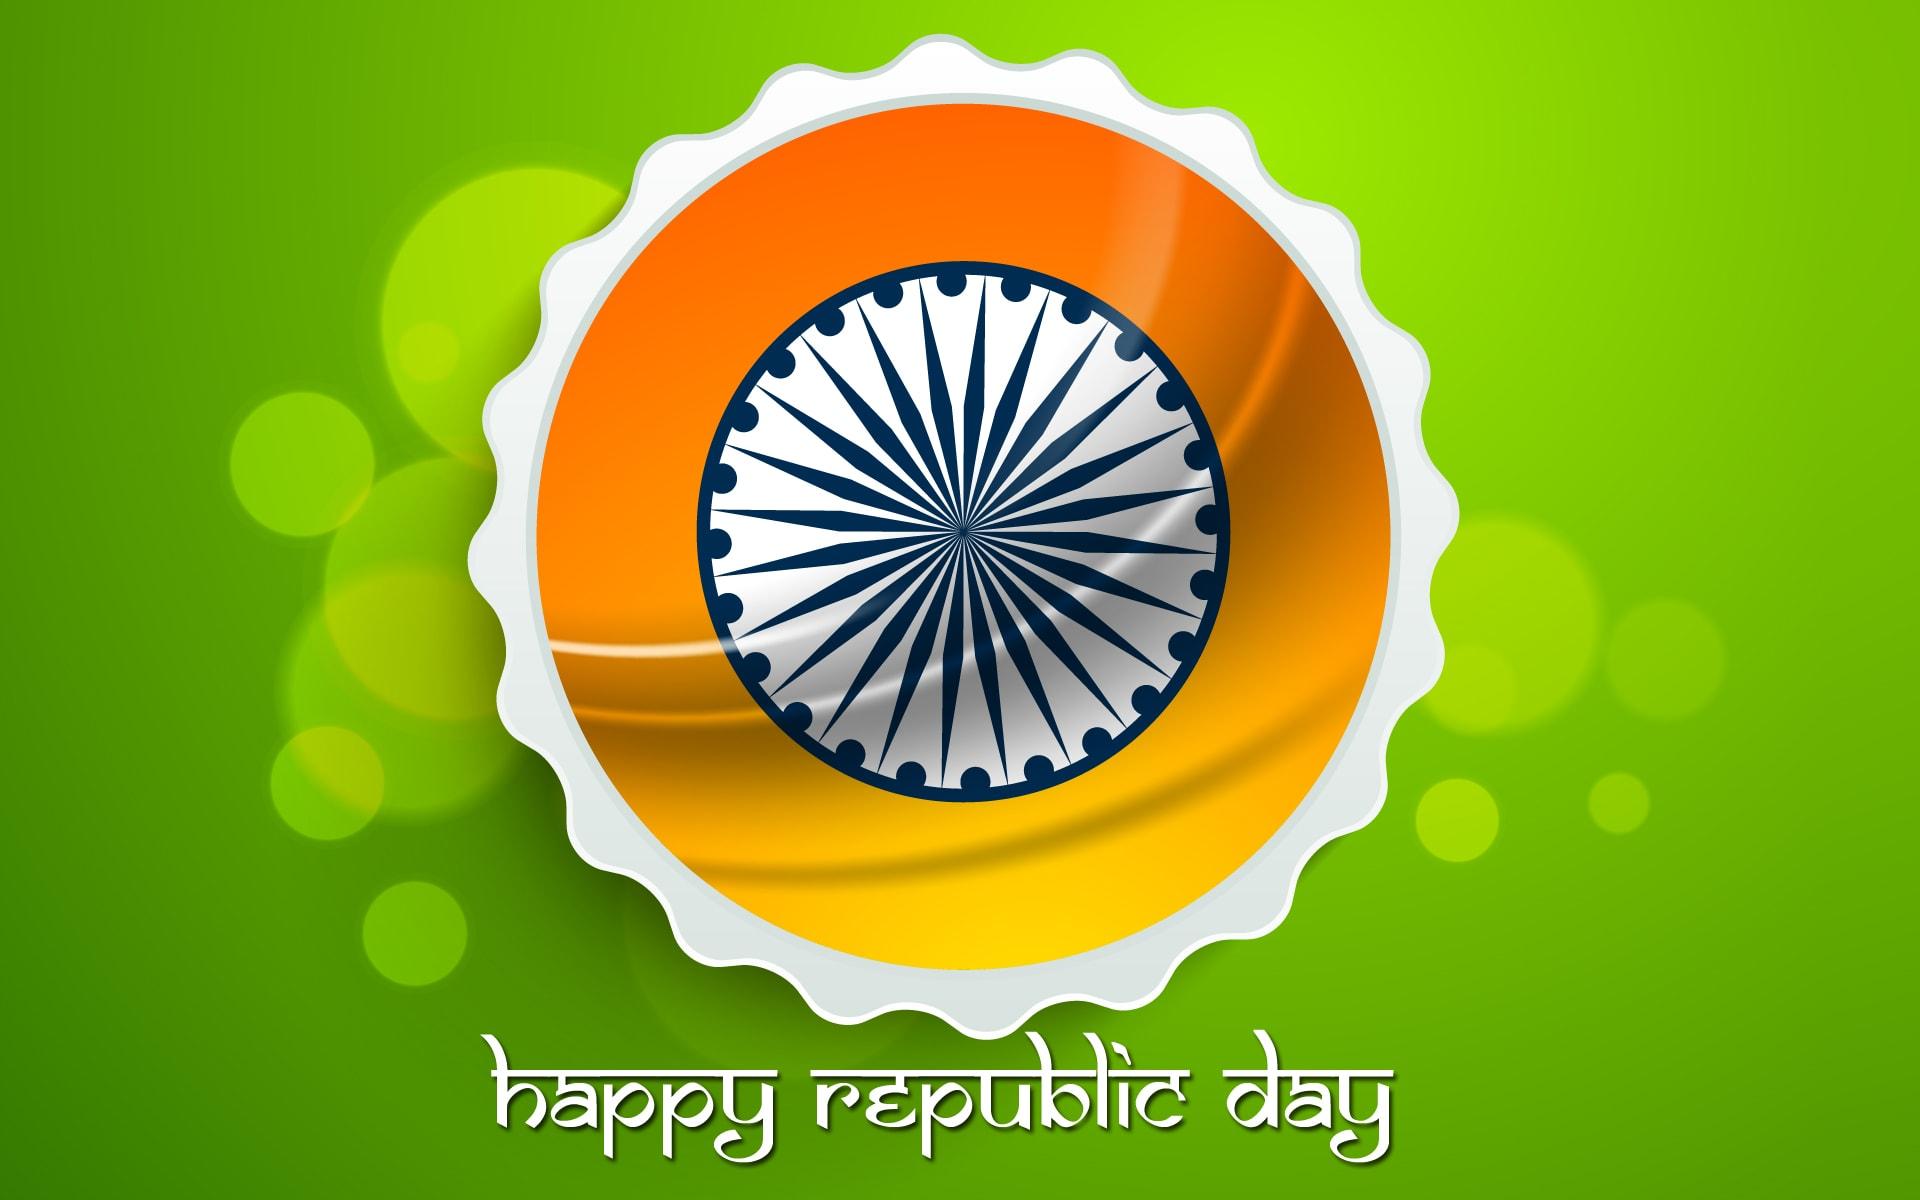 Republic Day 2018 HD Wallpaper for desktop